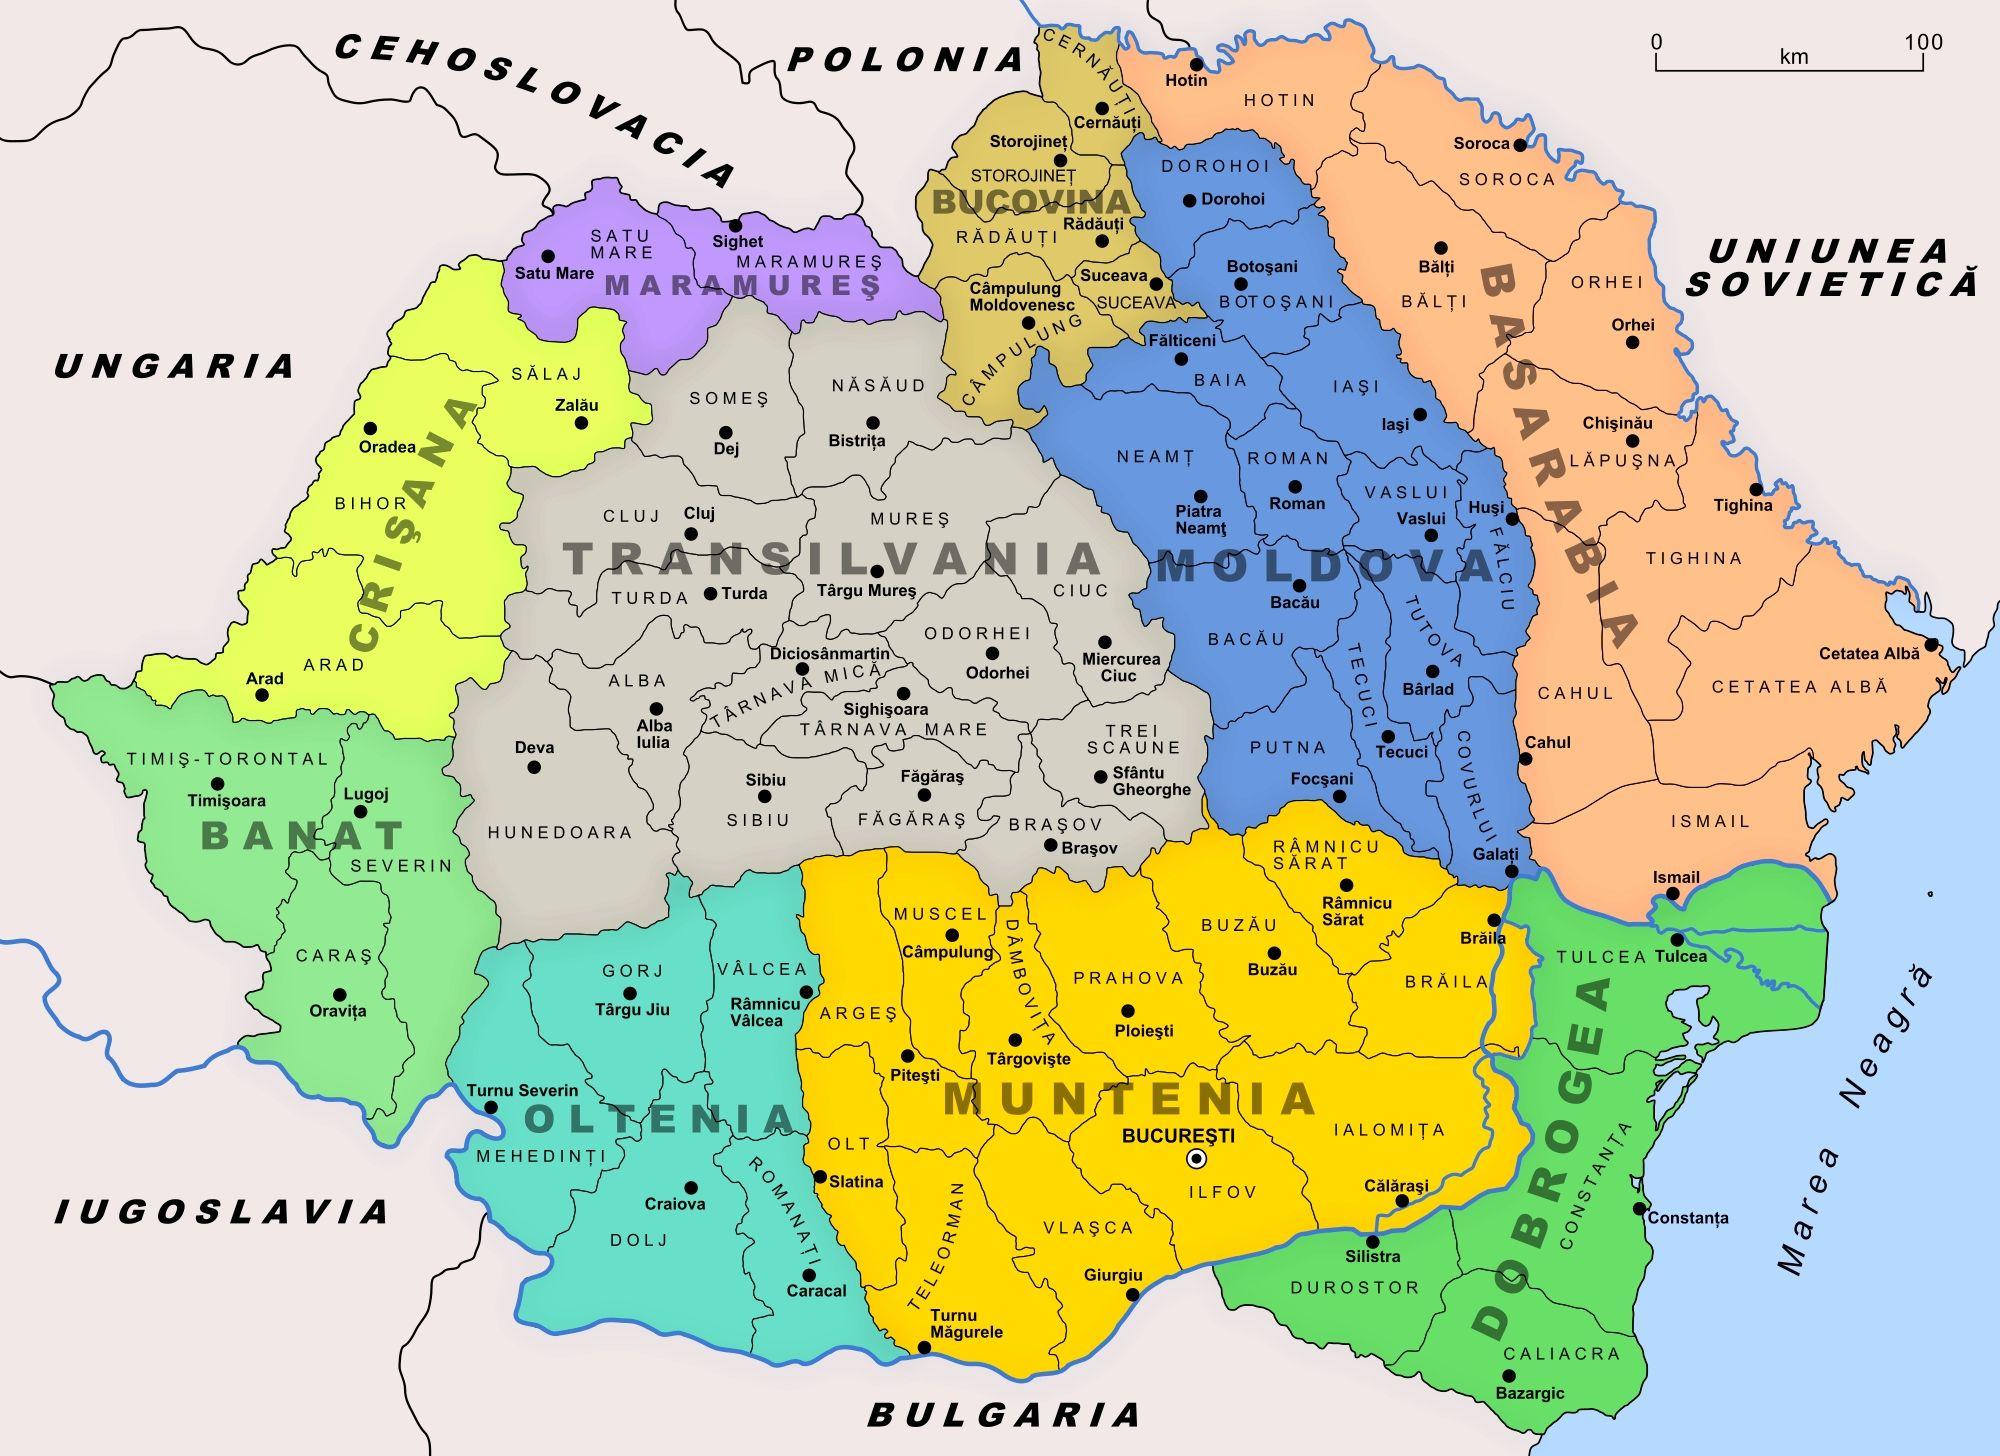 Pin by Romania on Romaniaa   Romania map, Romania, Map